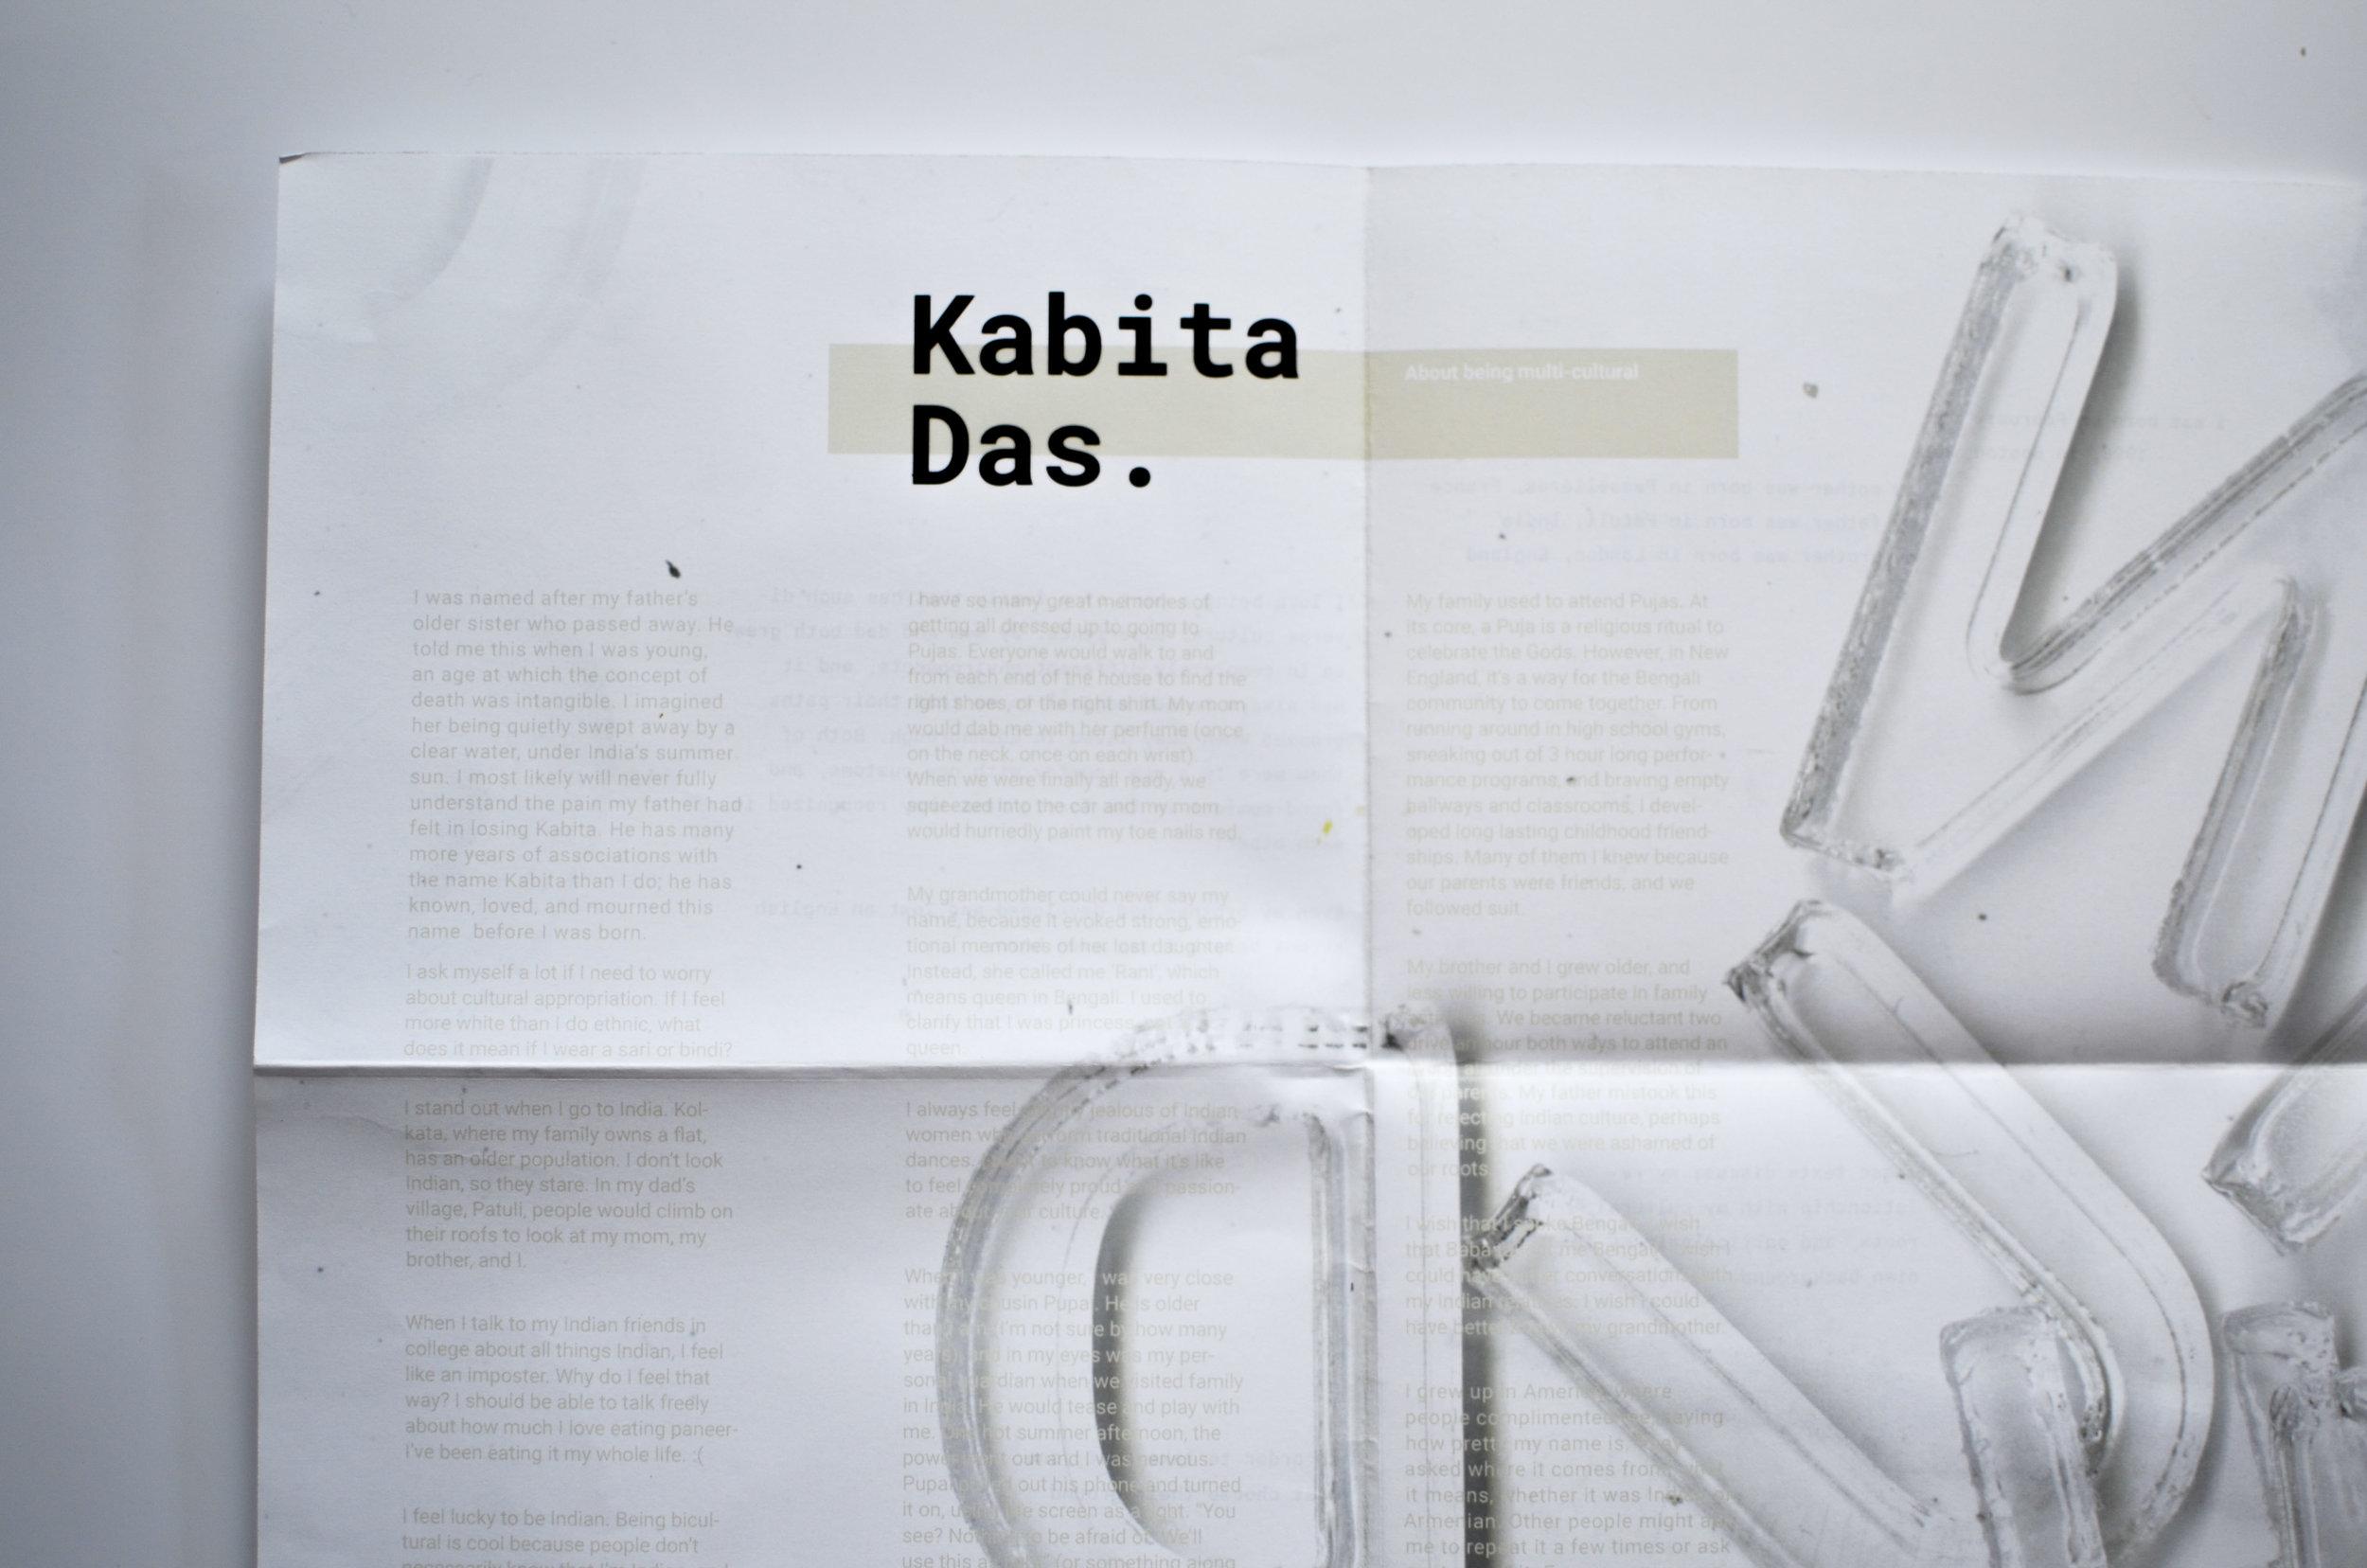 brochure_photo_04_das.JPG